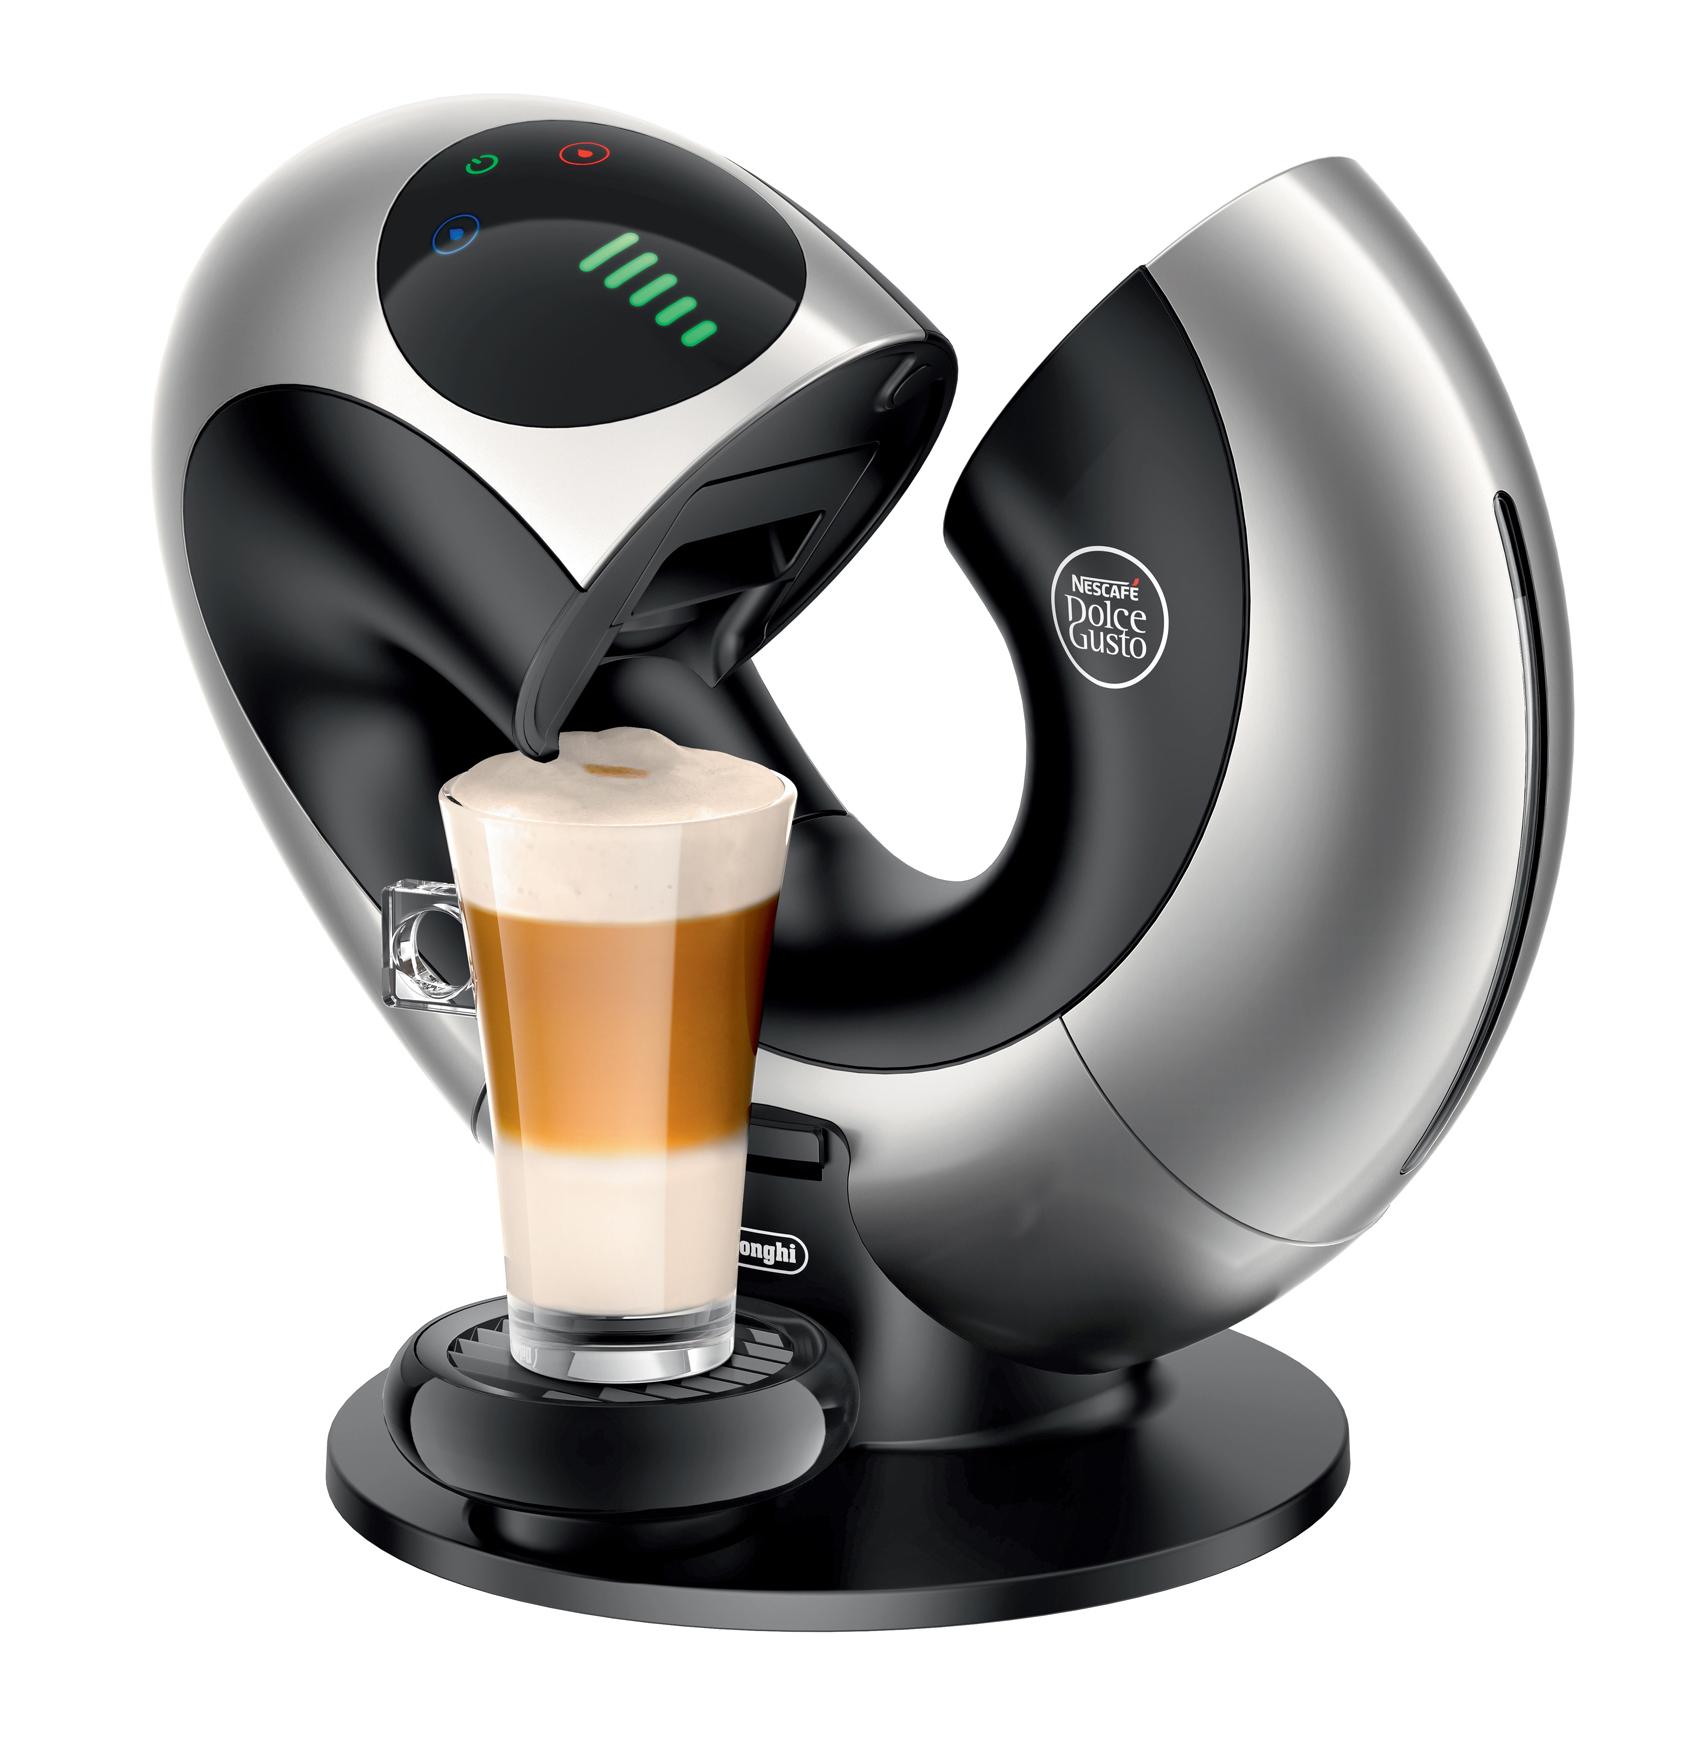 DeLonghi Nescafé Kaffeemaschine Dolce Gusto Eclipse ~ Kaffeemaschine Heißer Kaffee